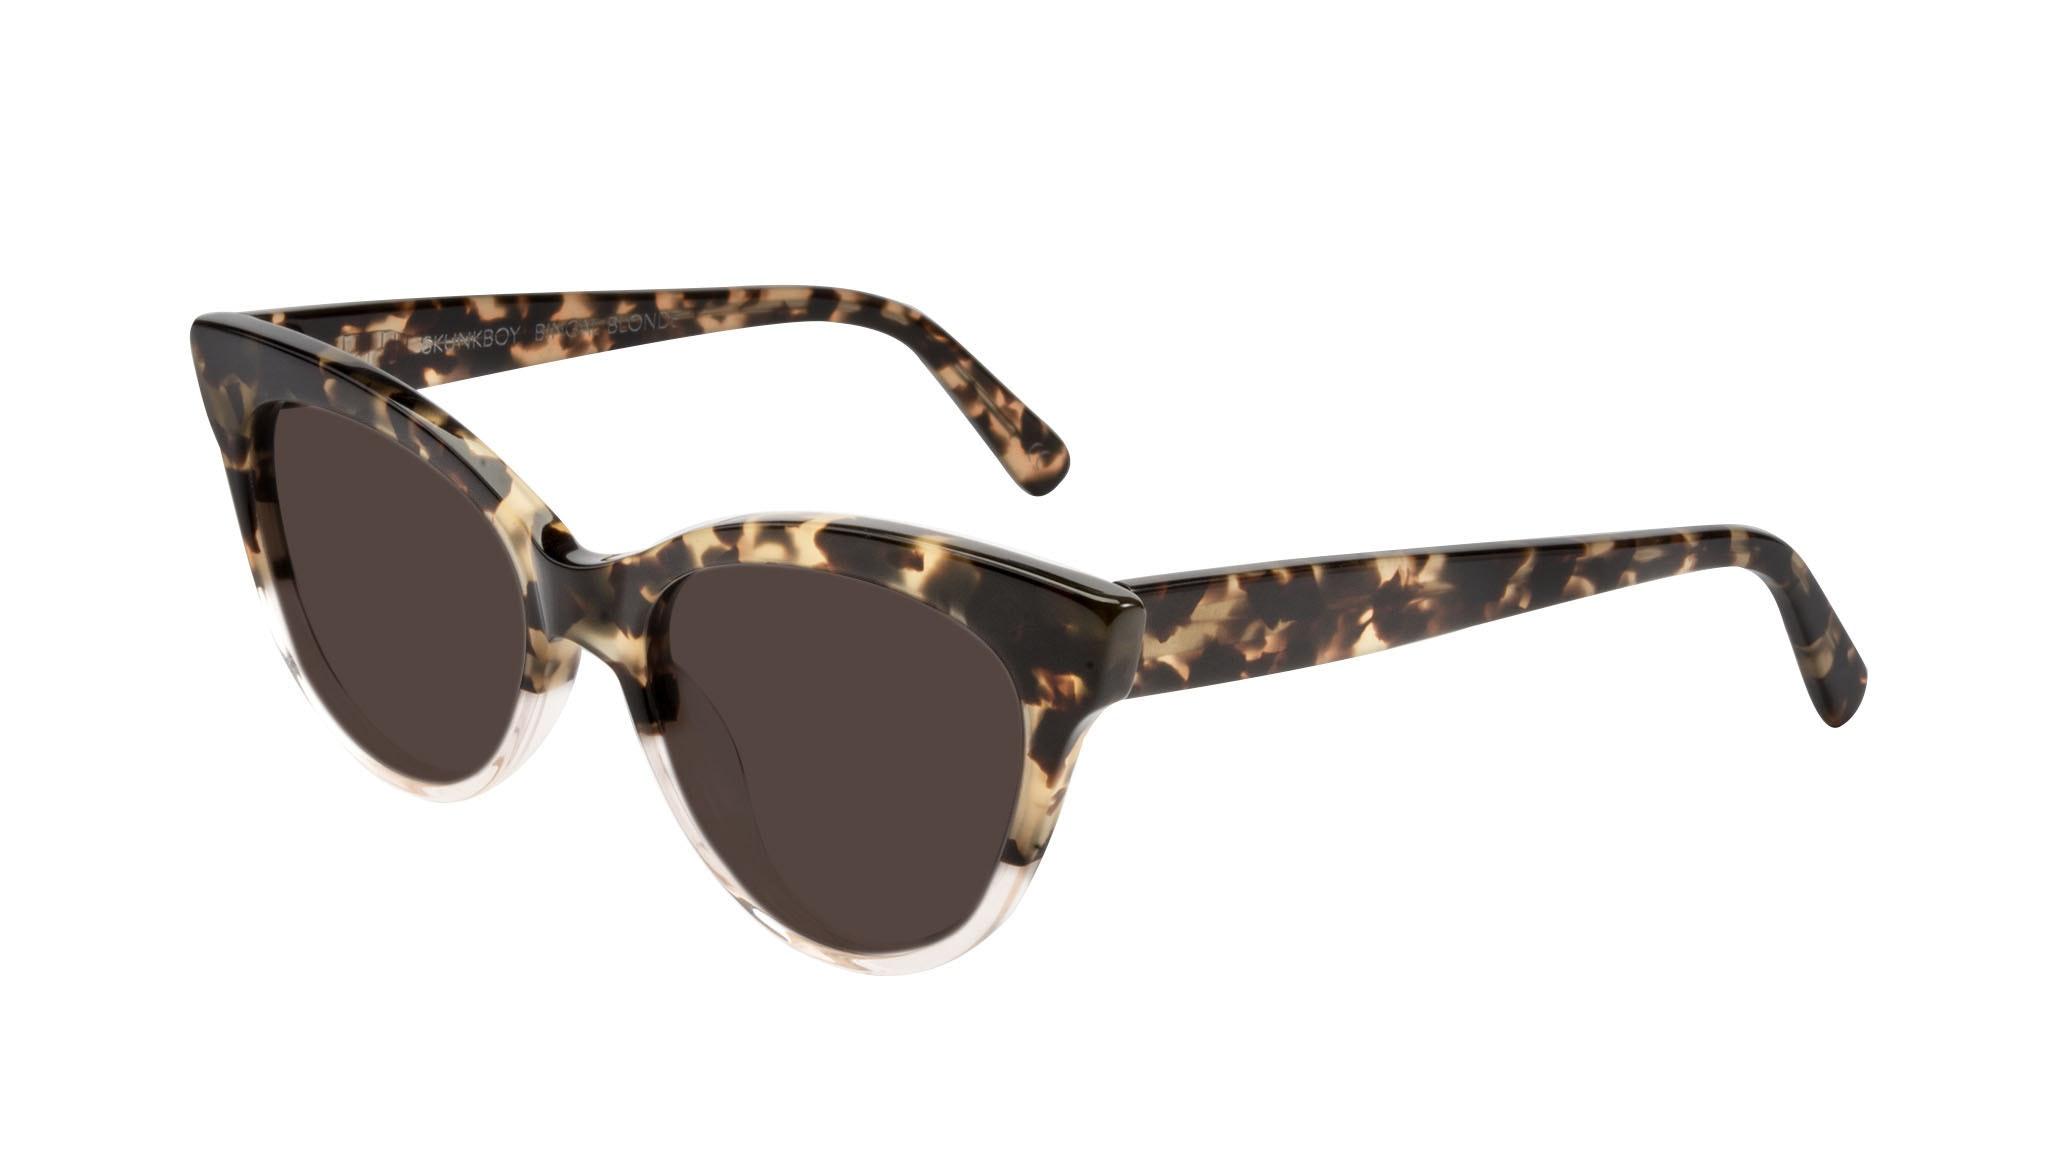 Affordable Fashion Glasses Cat Eye Sunglasses Women SkunkBoy Champagne Tort Tilt